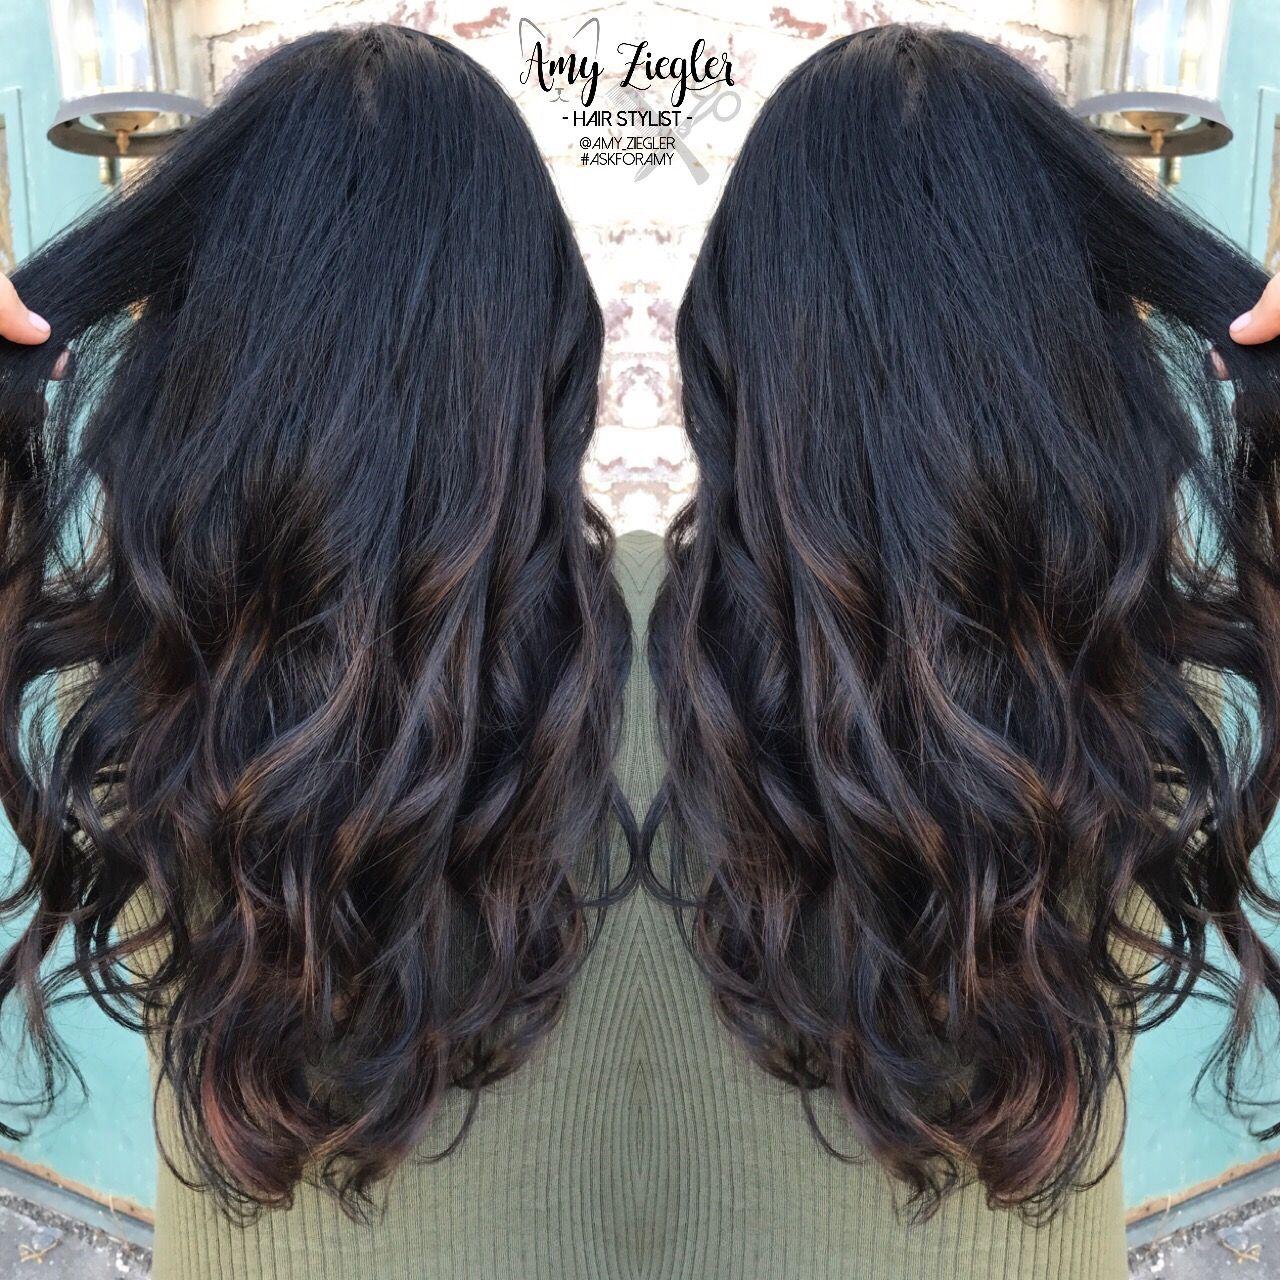 Subtle Balayage On Jet Black Hair By Askforamy Black Hair Ombre Black Hair Balayage Black Hair With Highlights